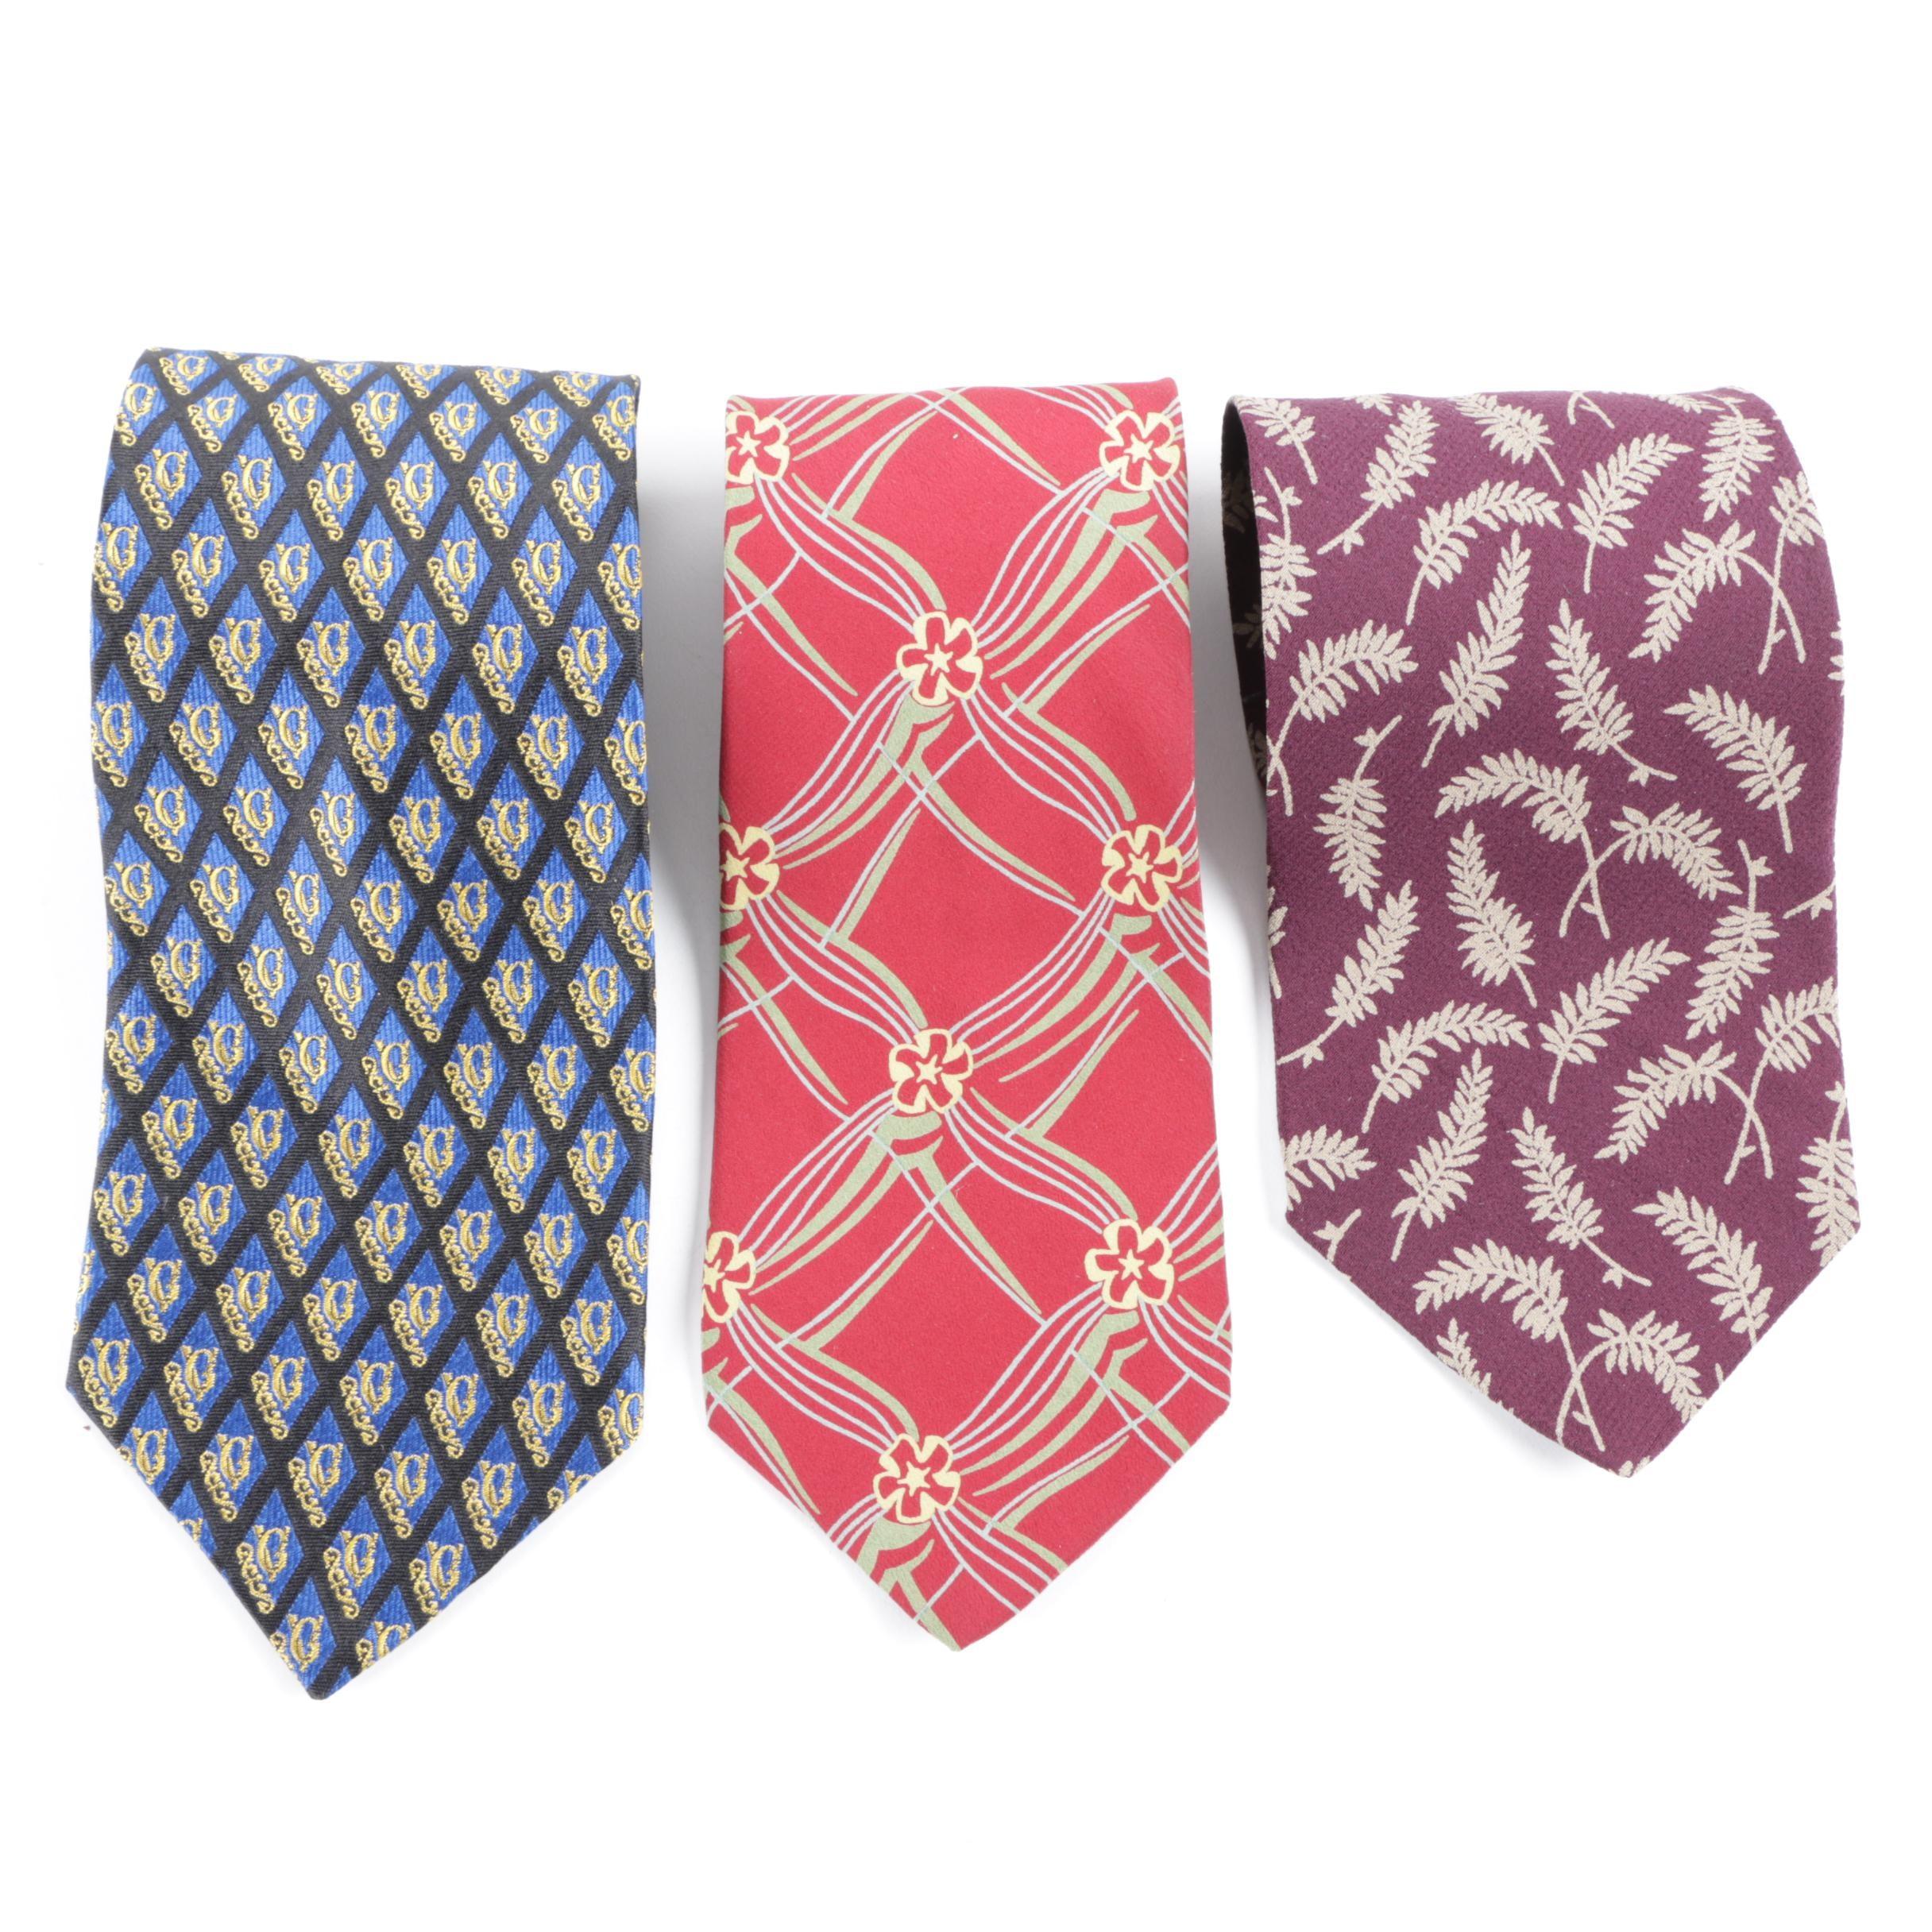 Giorgio Armani and Gianni Versace Silk Neckties